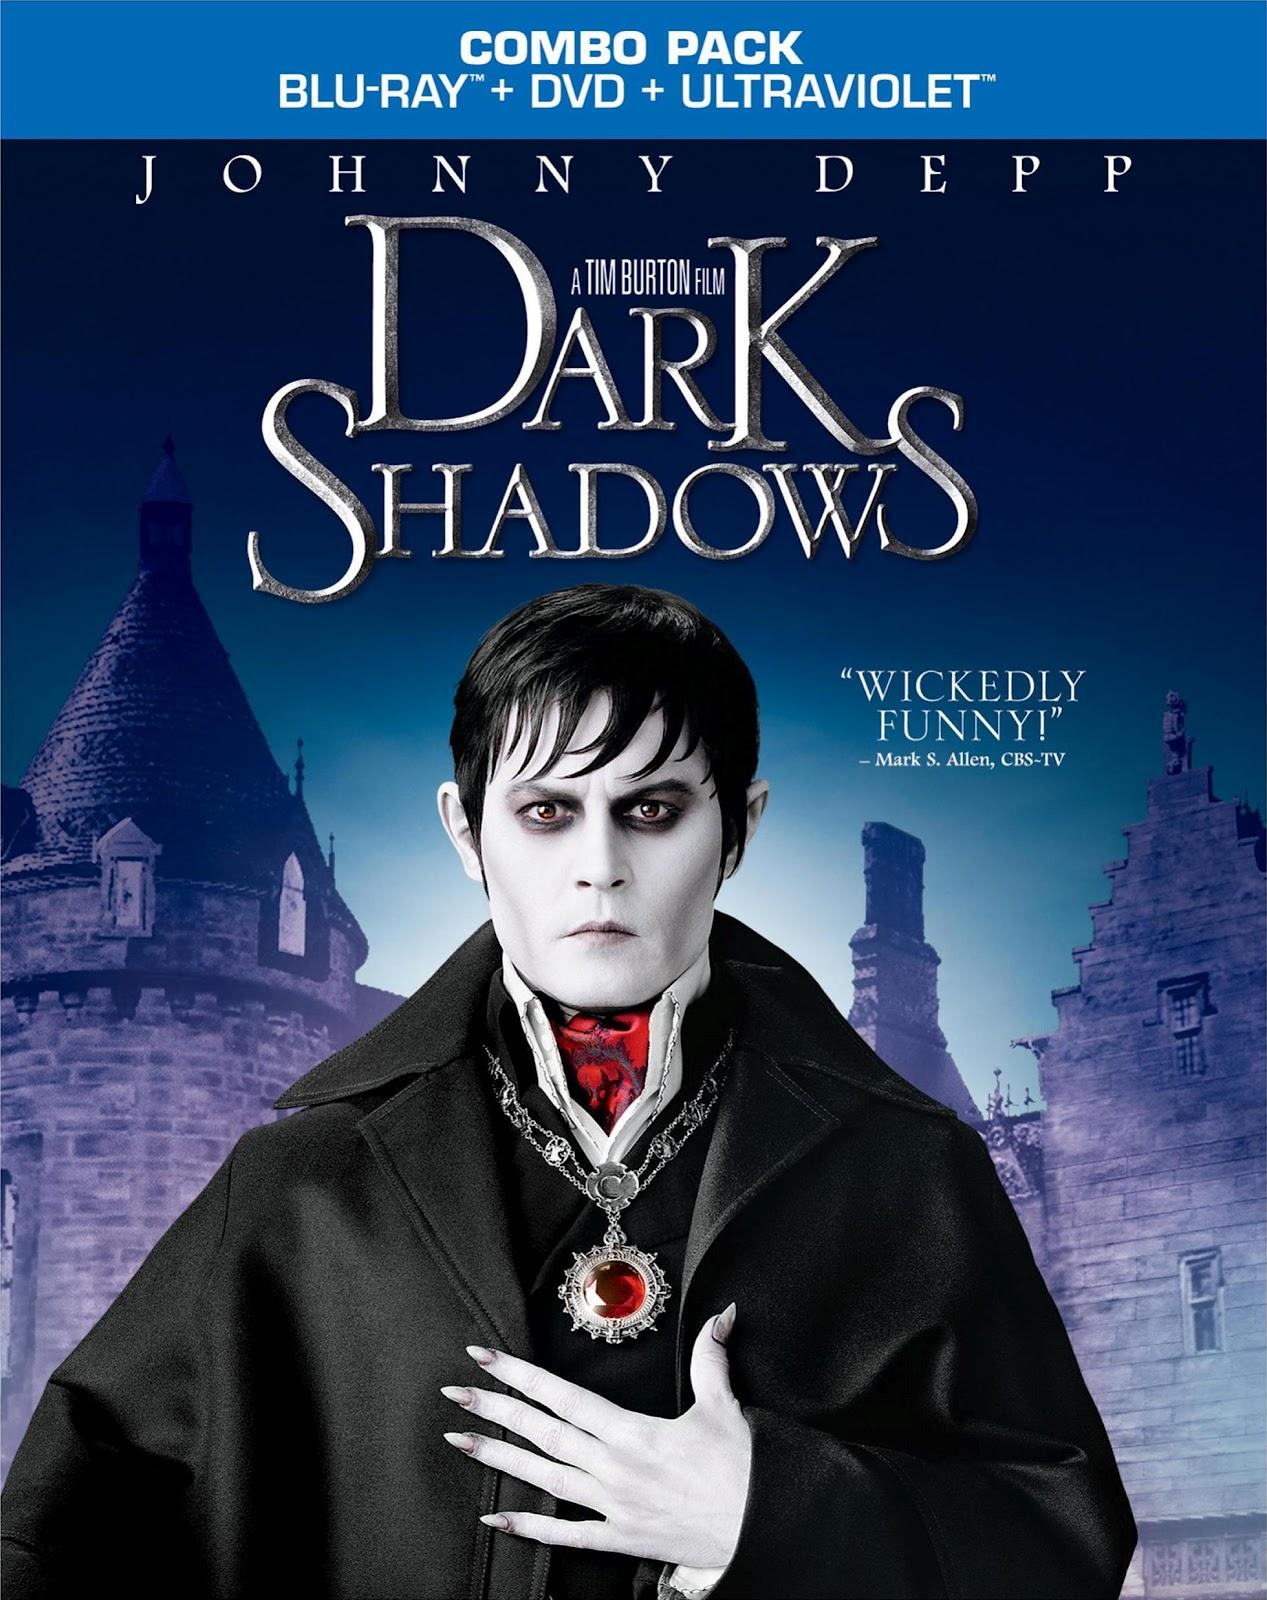 http://2.bp.blogspot.com/-F7jYAMEAans/UGzWANa2DUI/AAAAAAAAGFc/fv54I3Zvvis/s1600/Dark+Shadows+Blu-Ray.jpg